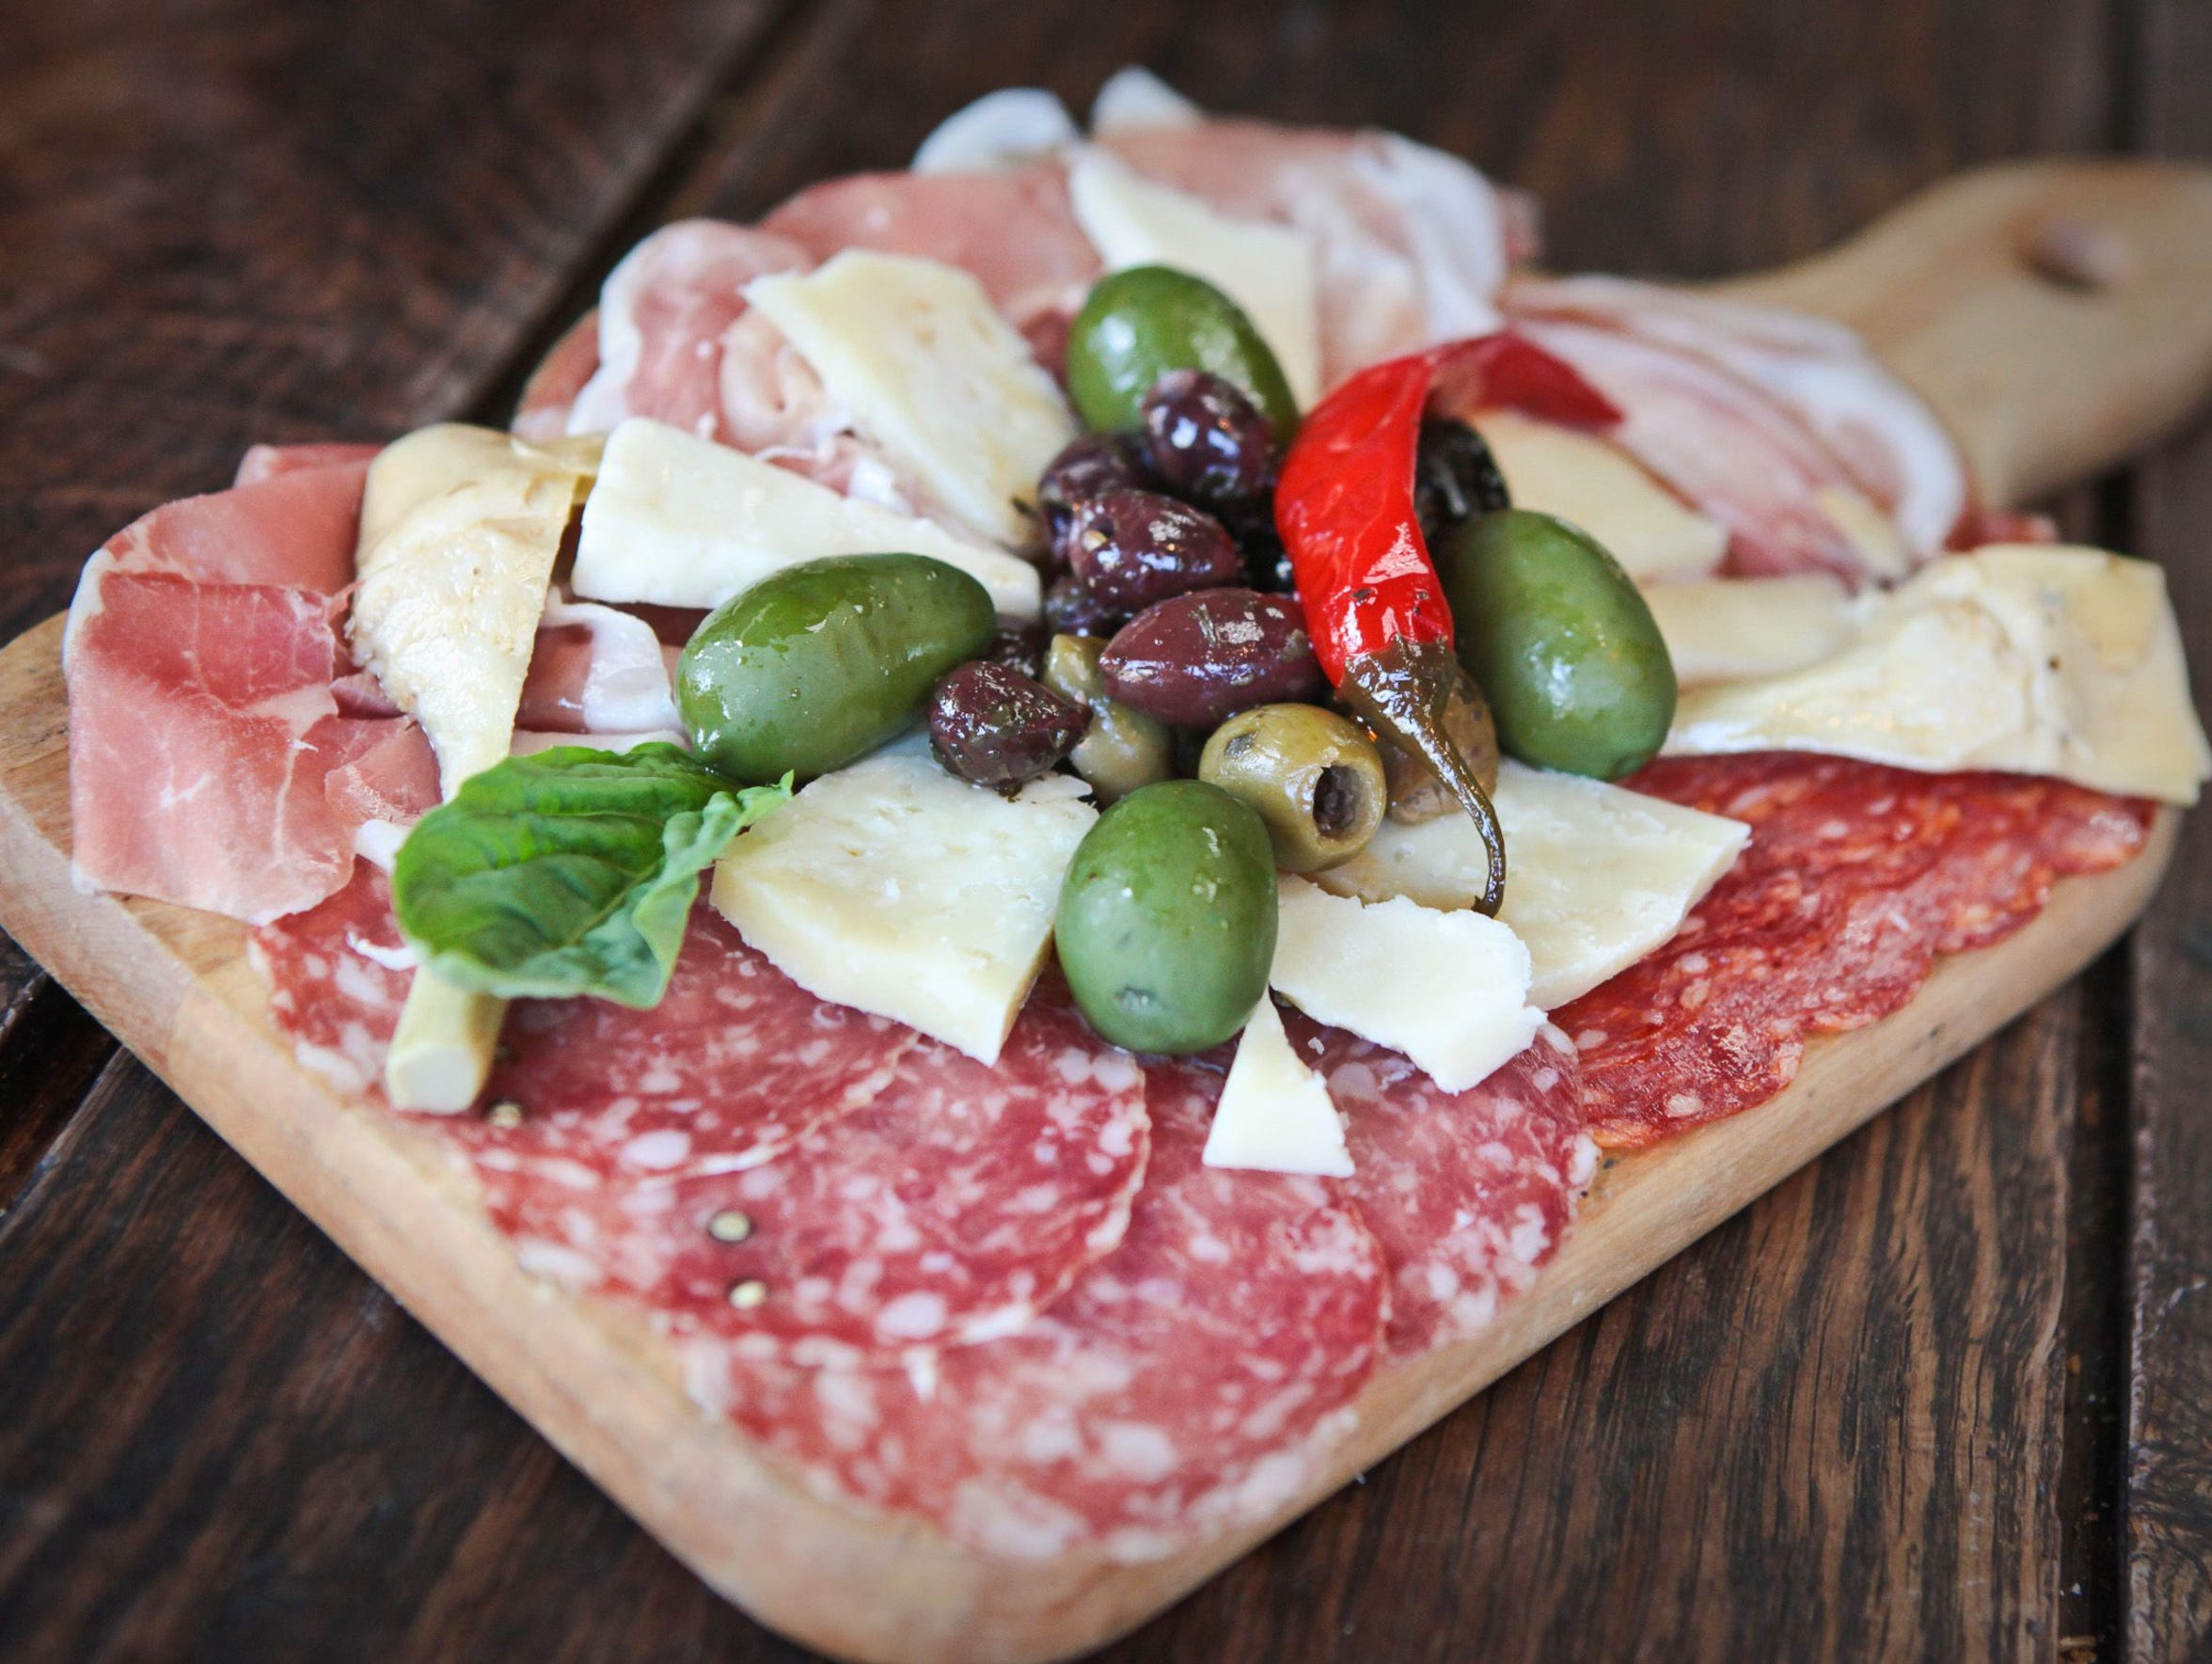 Antipasto from Andreoli Italian Grocer in Scottsdale.